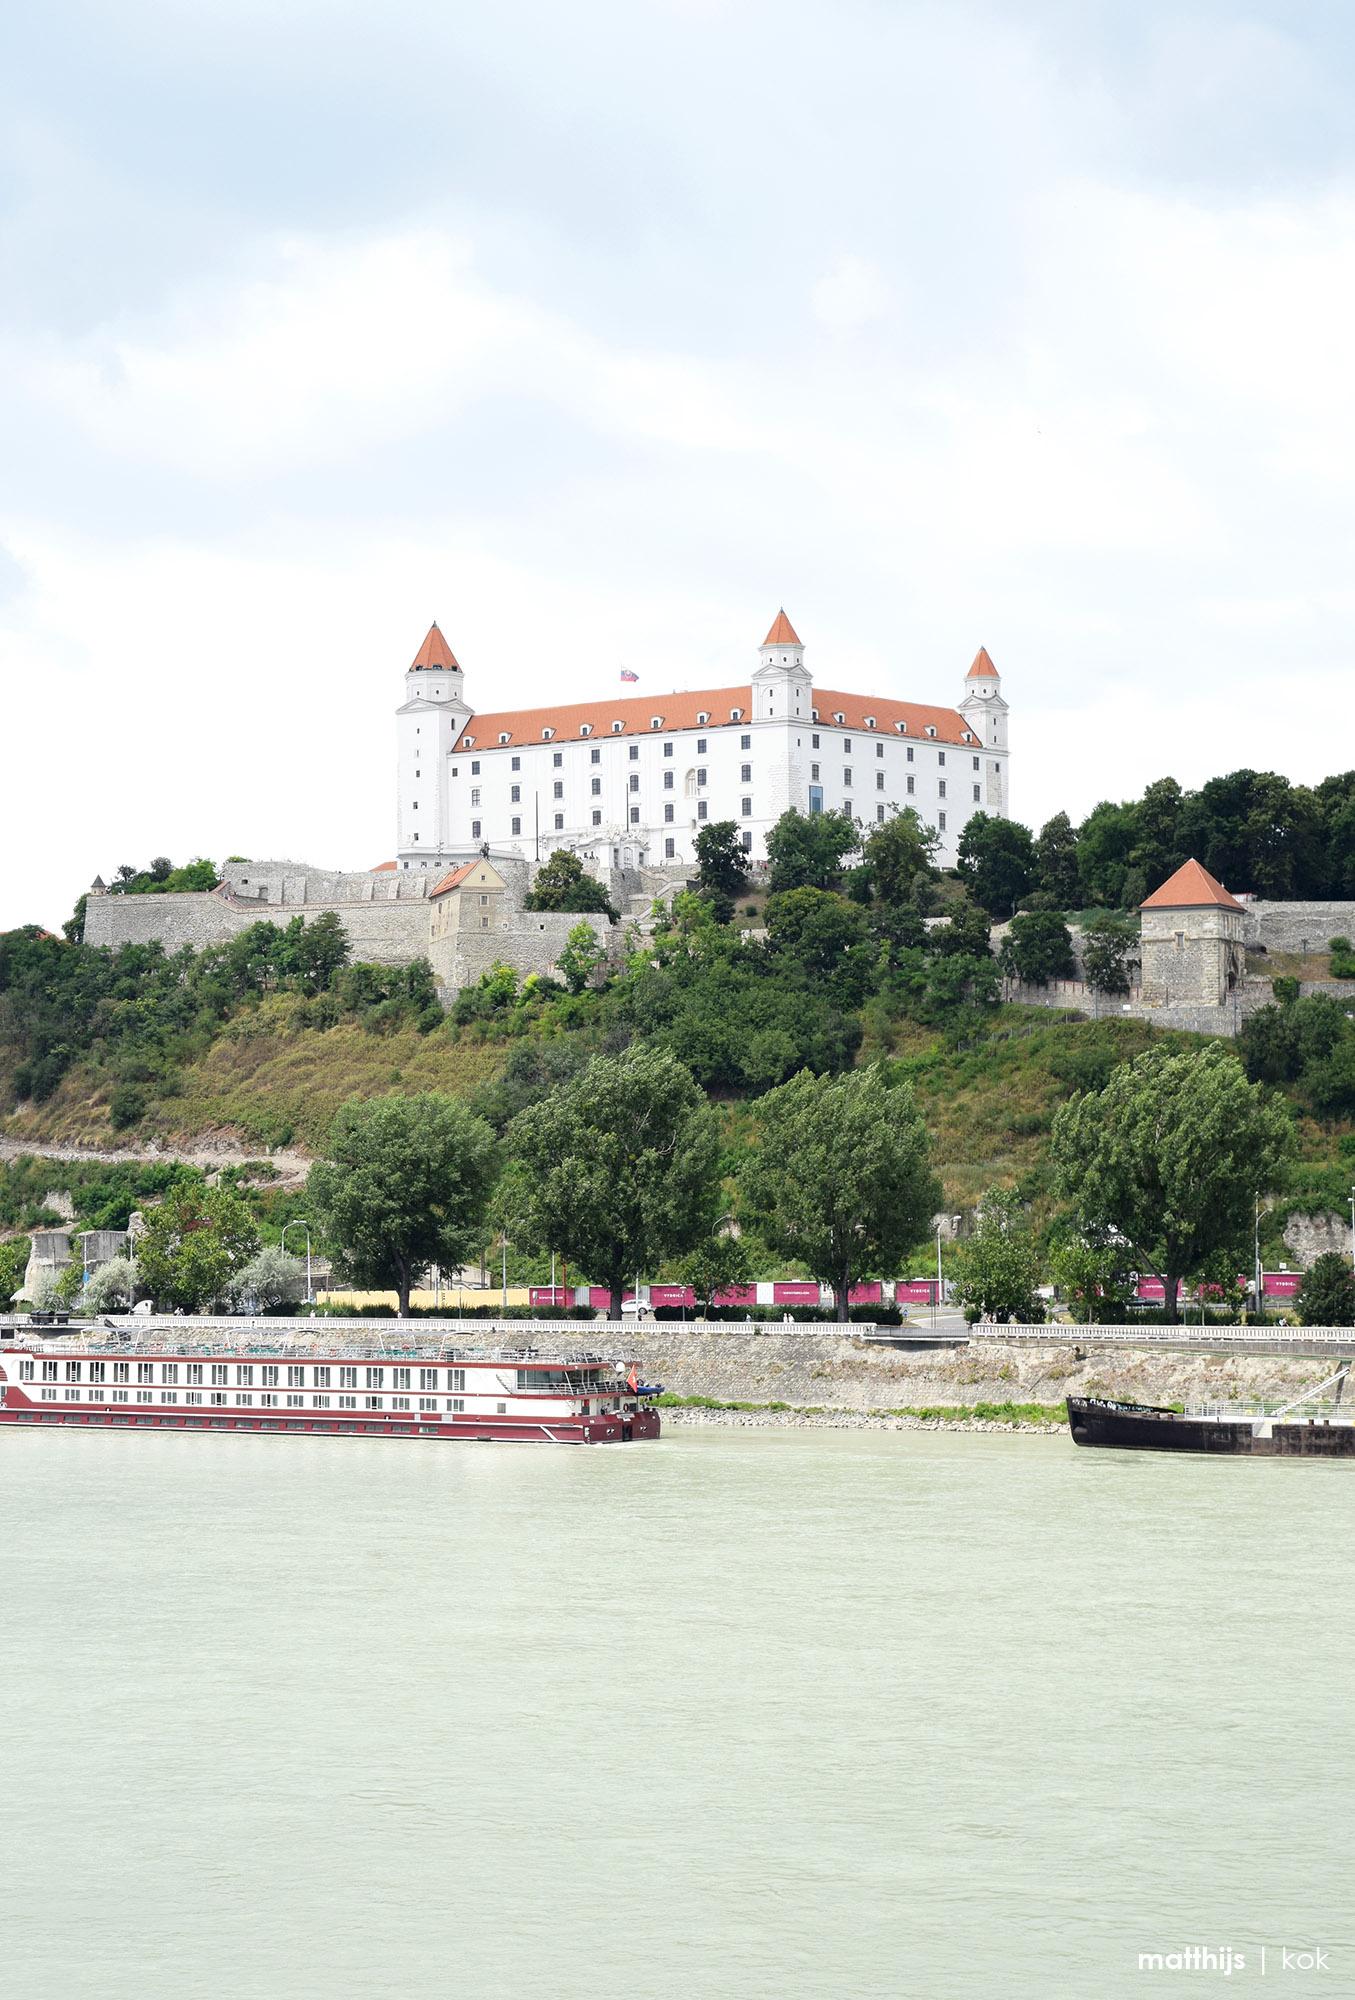 Bratislava Castle, Slovakia | Photo by Matthijs Kok